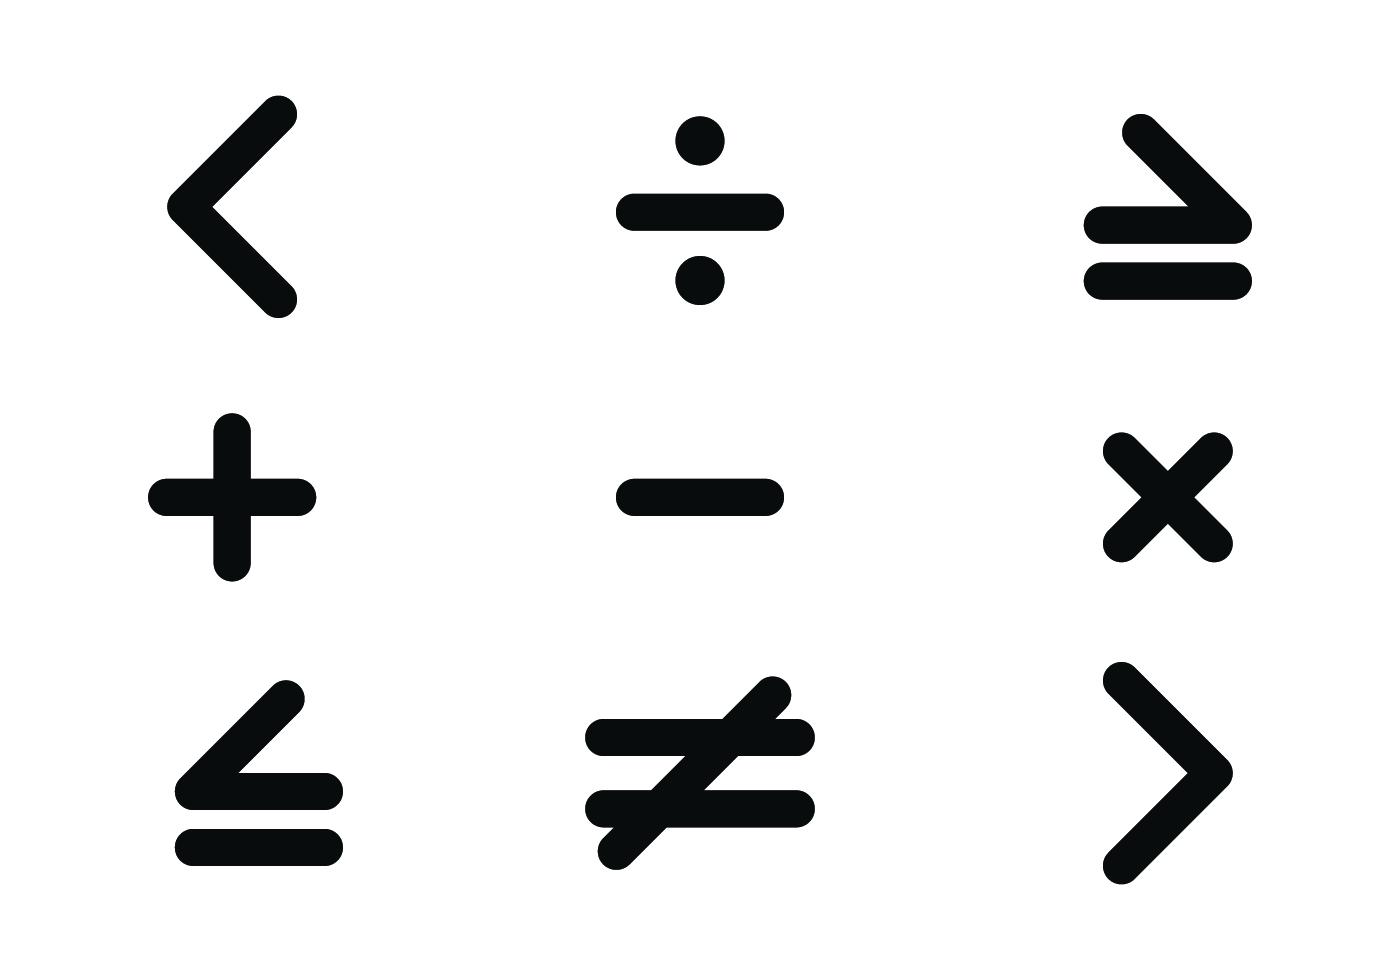 Image Free Math Symbols Vectorg Math Physics Problems Wikia